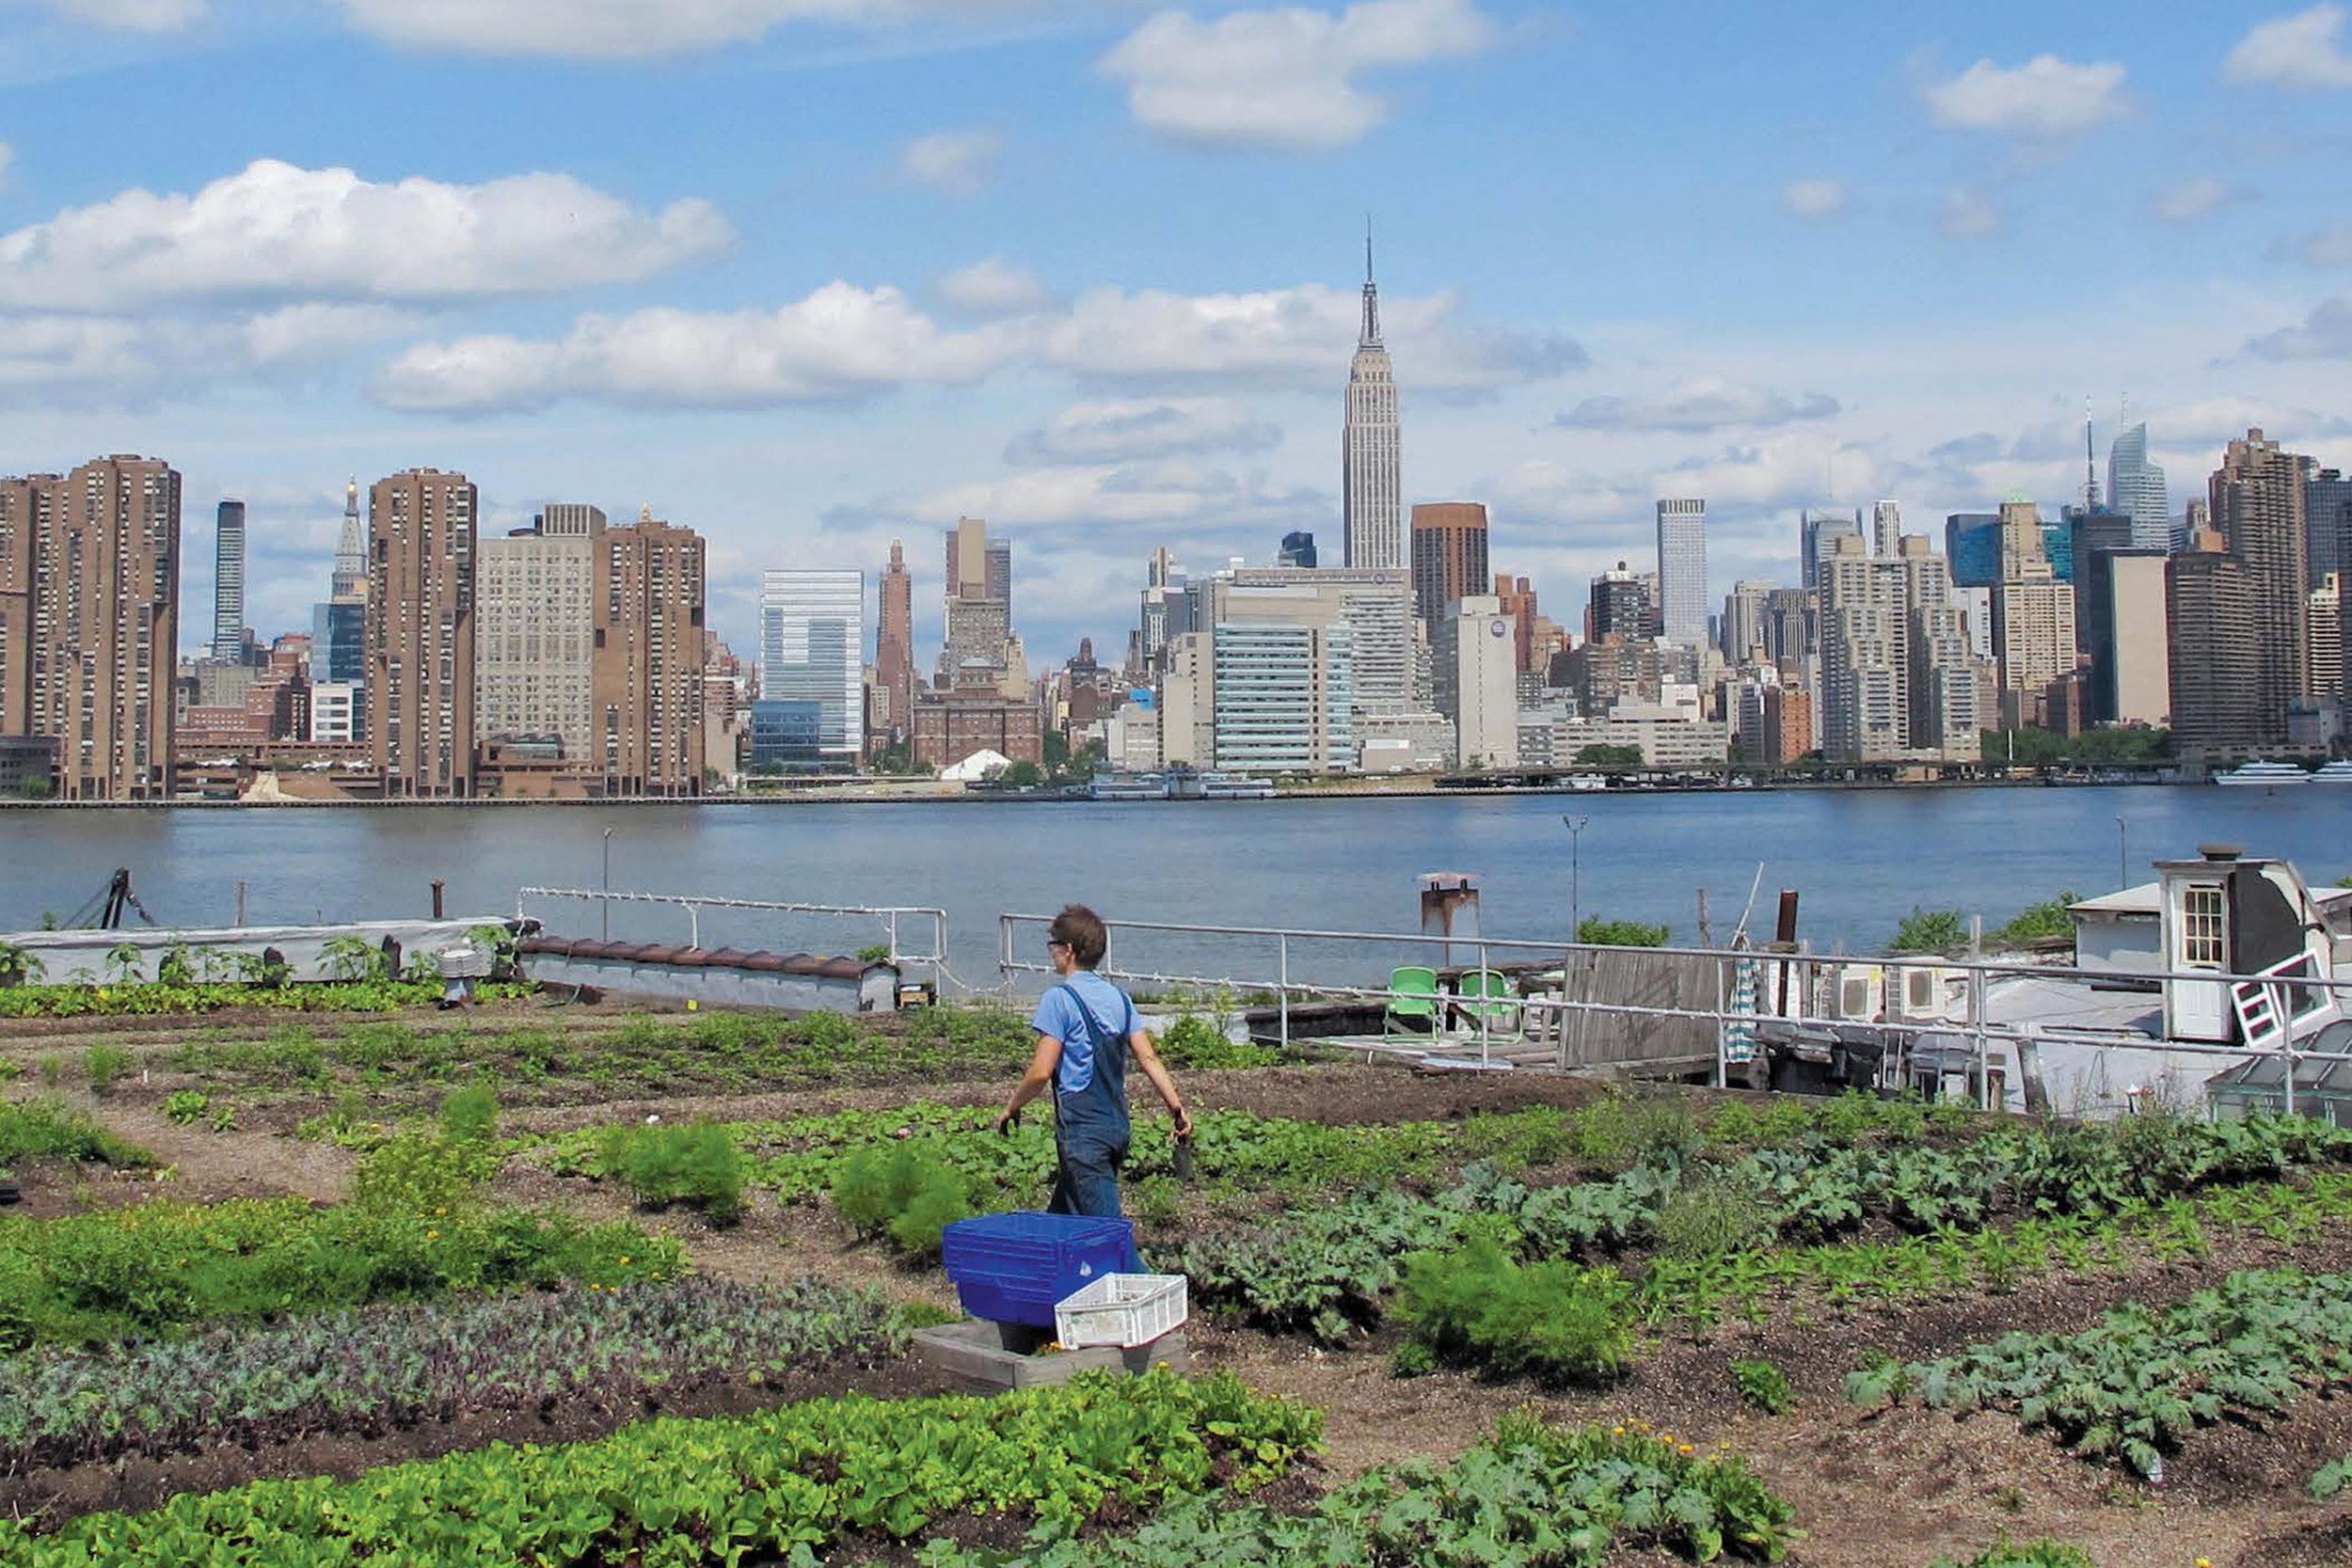 rooftop-garden-brooklyn-new-york.jpg